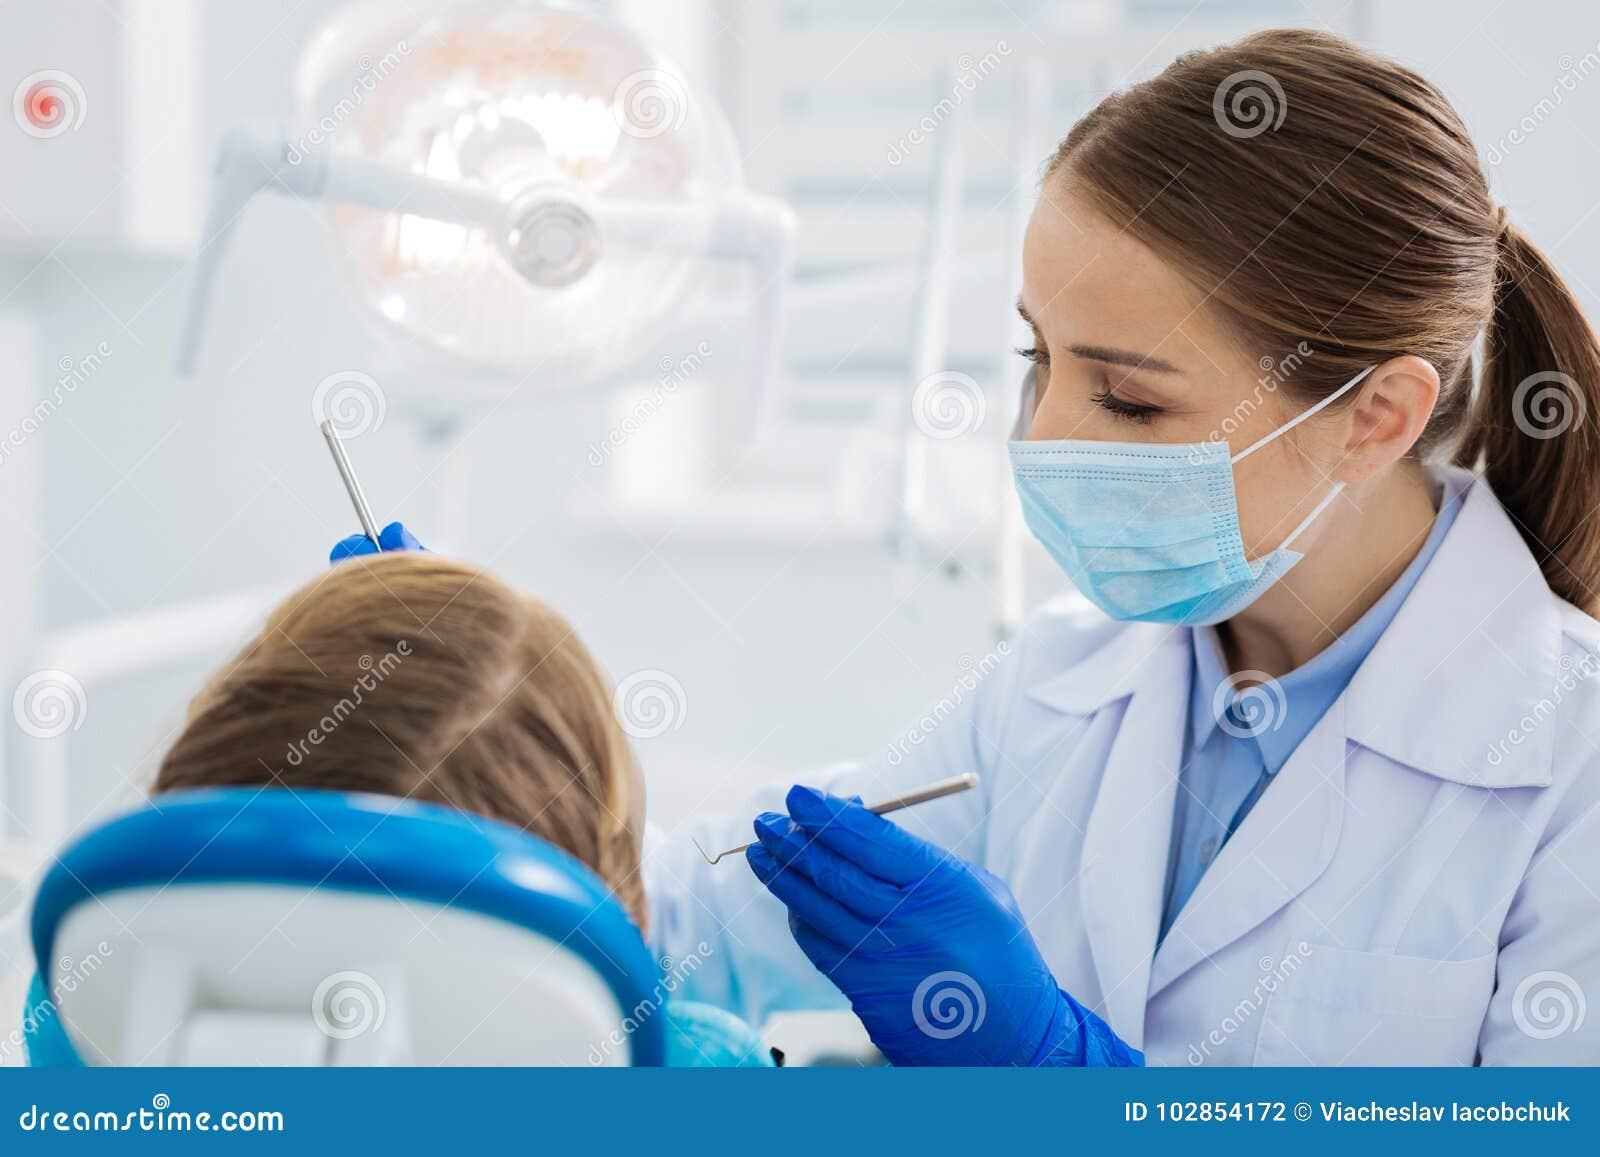 Prettige professionele tandarts die haar werk doen